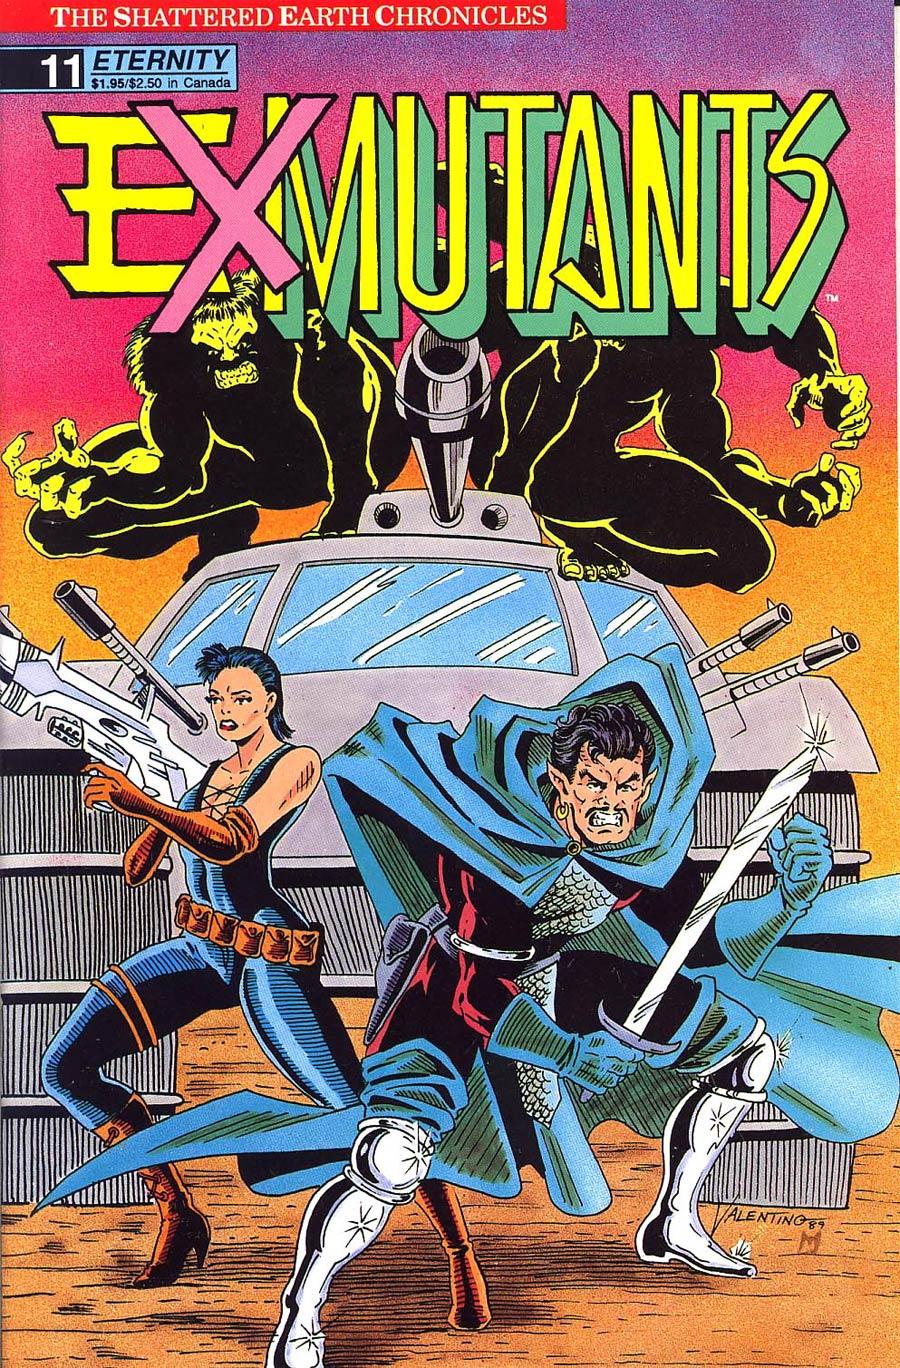 Ex-Mutants Shattered Earth Chronicles #11